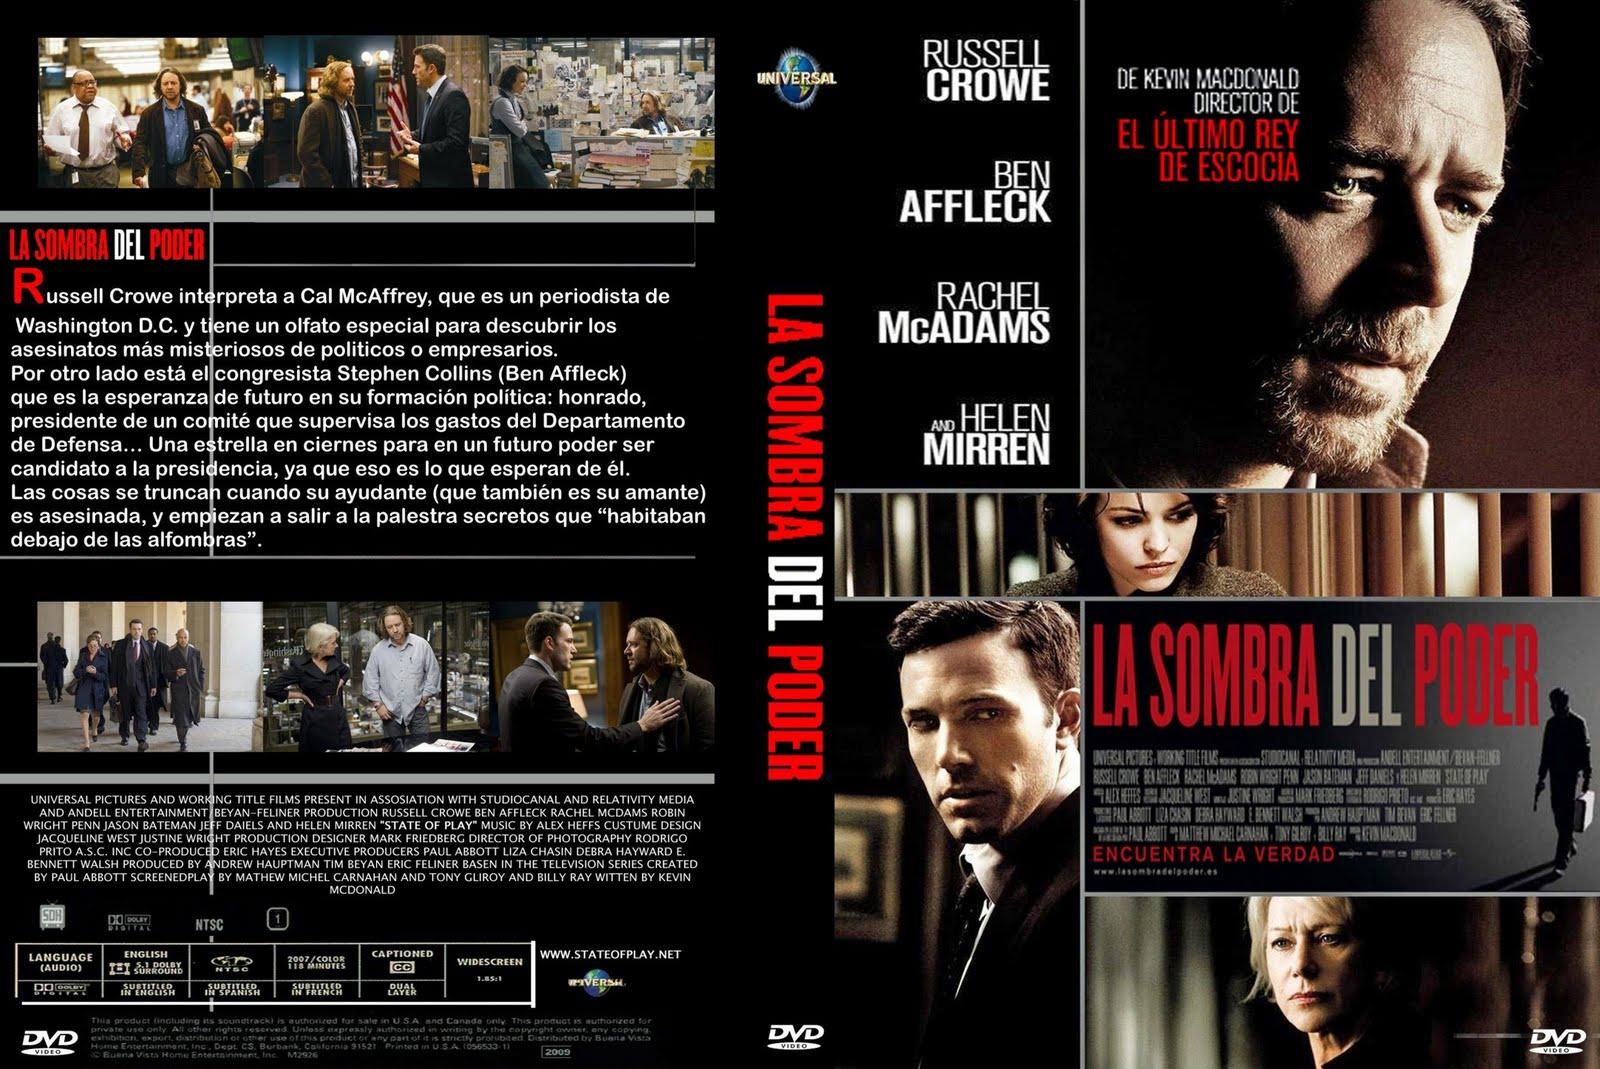 http://2.bp.blogspot.com/-Gm1yPsvZMHU/TctTER34rnI/AAAAAAAAADM/vMI1iSJuZzI/s1600/La_Sombra_Del_Poder_1.jpg